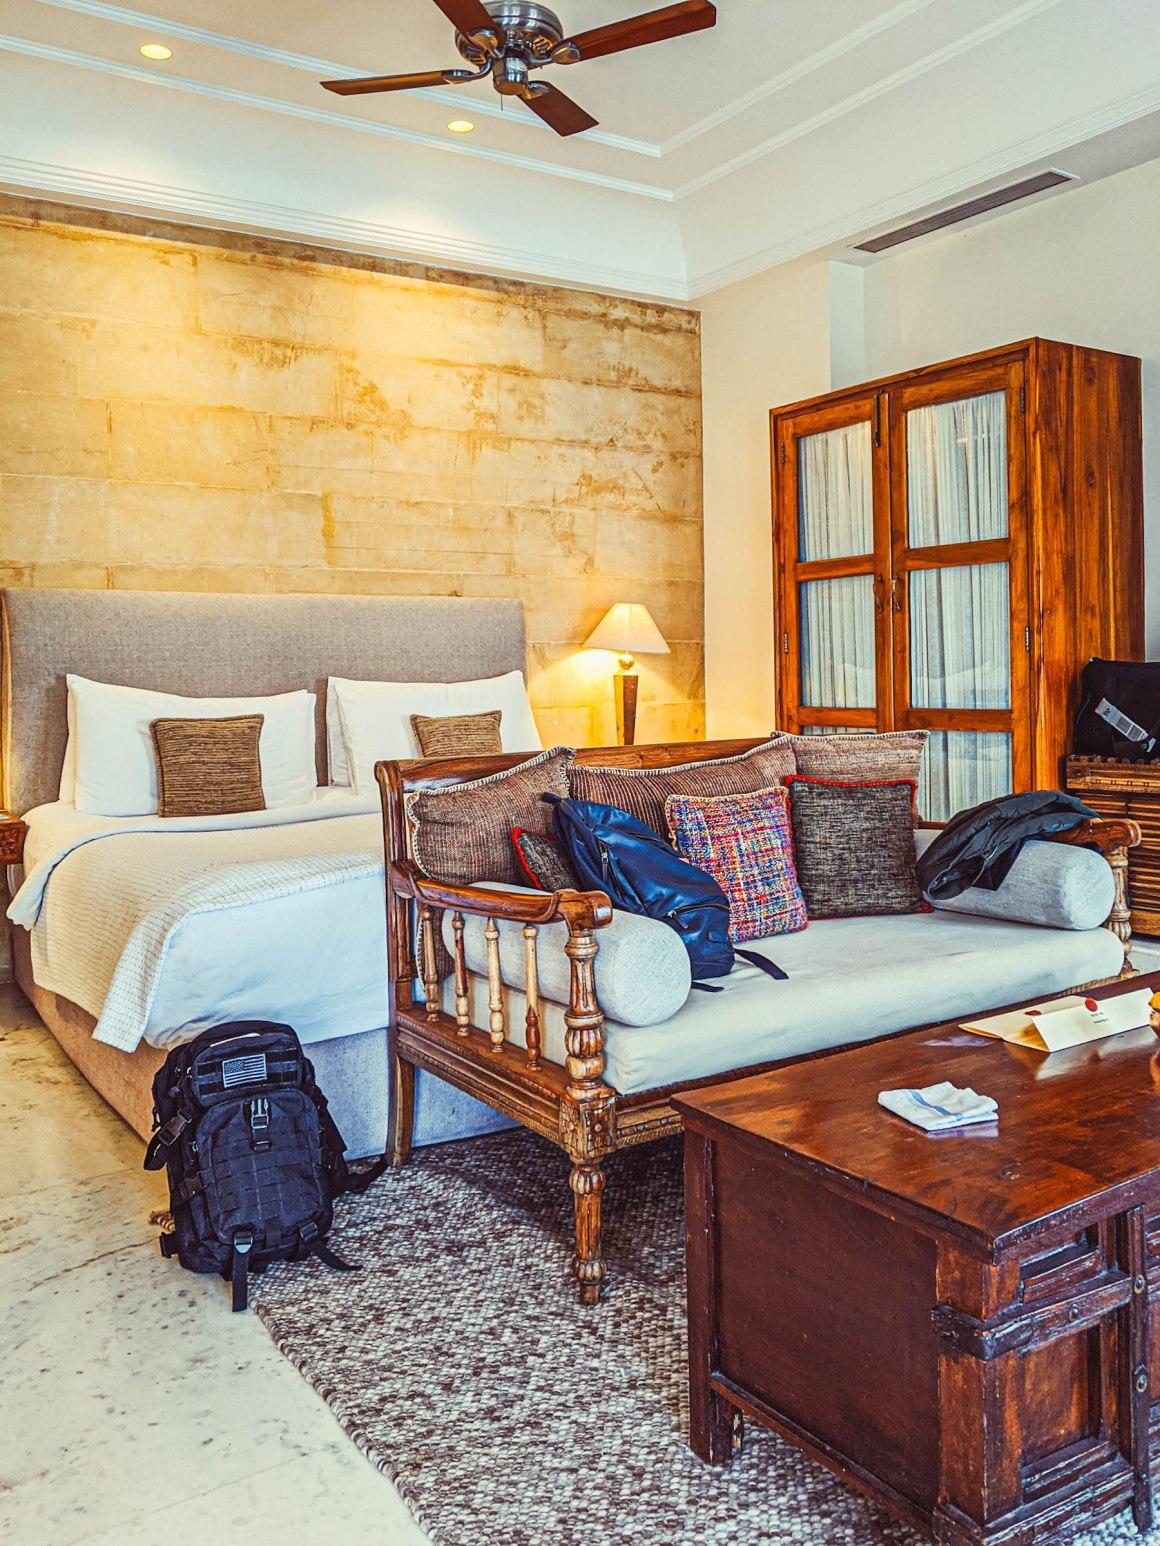 nainaxsuryagarh, naina.co, naina redhu, nakul hada, suryagarh jaisalmer, siddharth yadav, karan vaid singh, suryagarh, jaisalmer, rajasthan, eyesforrajasthan, new year 2020, 40and10in2020, heart, bharat, travel, eyesfordestinations, india, eyesforindia, happy new year, vacation, year end, travel photographer, travel blogger, luxury room, rajasthan hotel, indian hotel, jaisalmer hotel, exceptional hospitality, turning 40